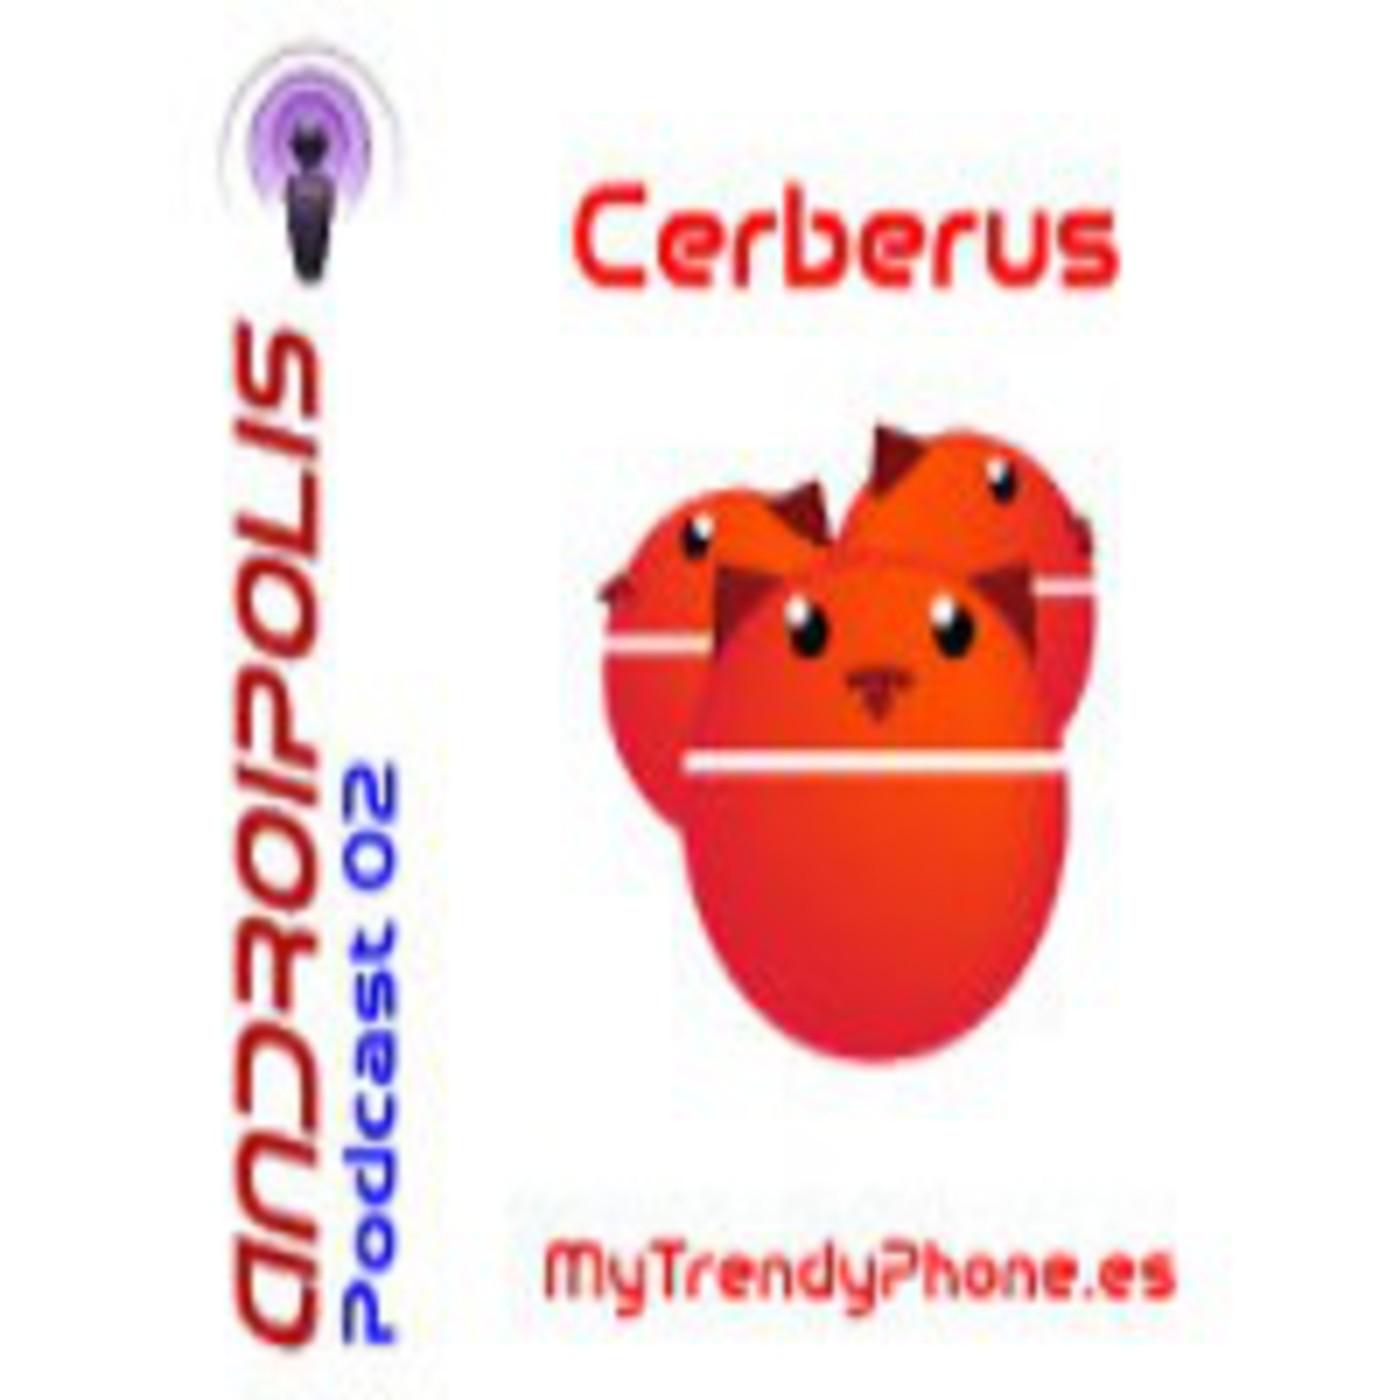 Podcast 02 - CERBERUS. Protege tu móvil de robos y pérdidas. MyTrendyPhone